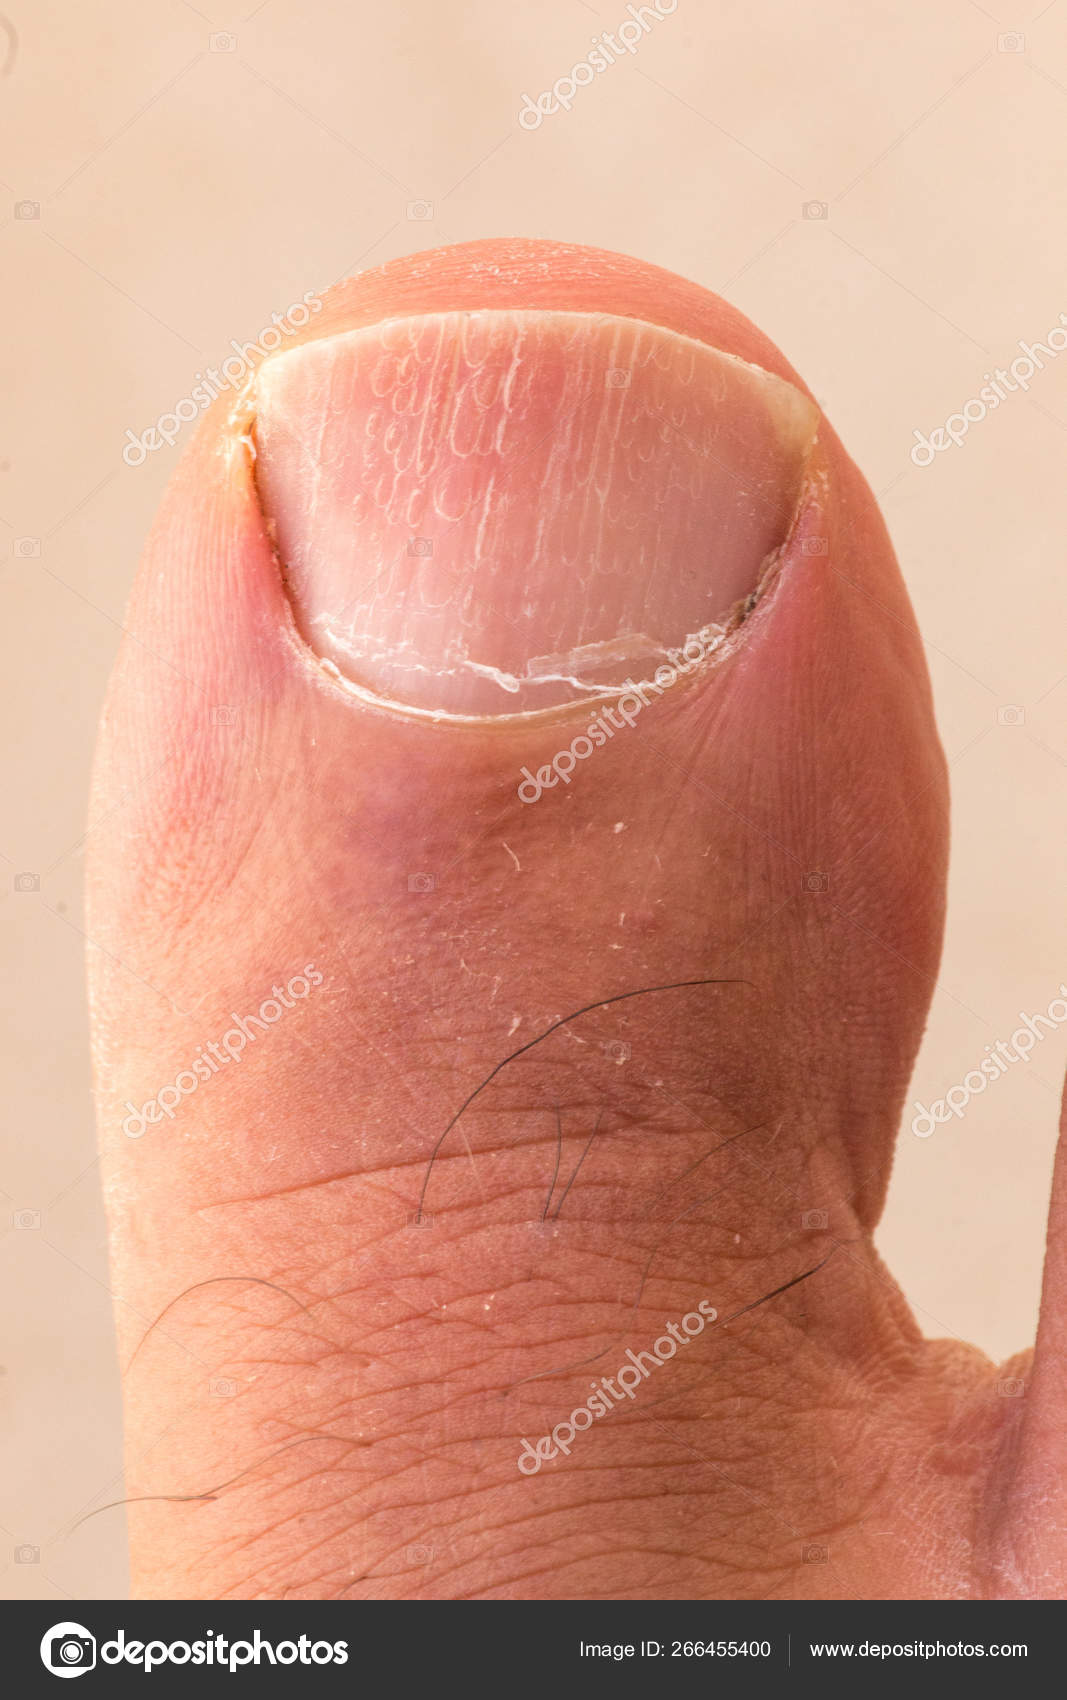 Big Toe Ingrown Toenail Scaly Dry Skin